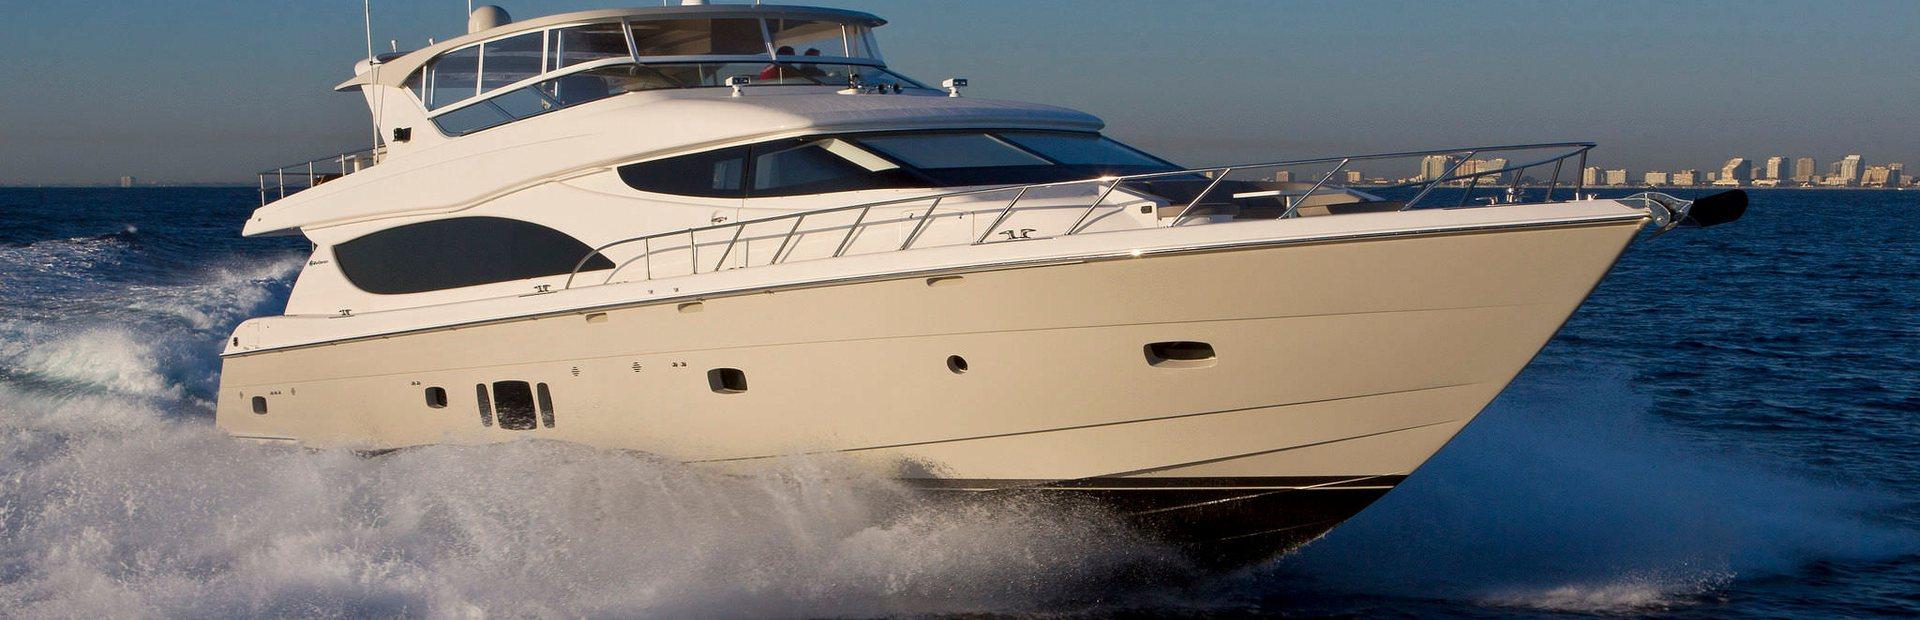 Hatteras 80 Yacht Charter